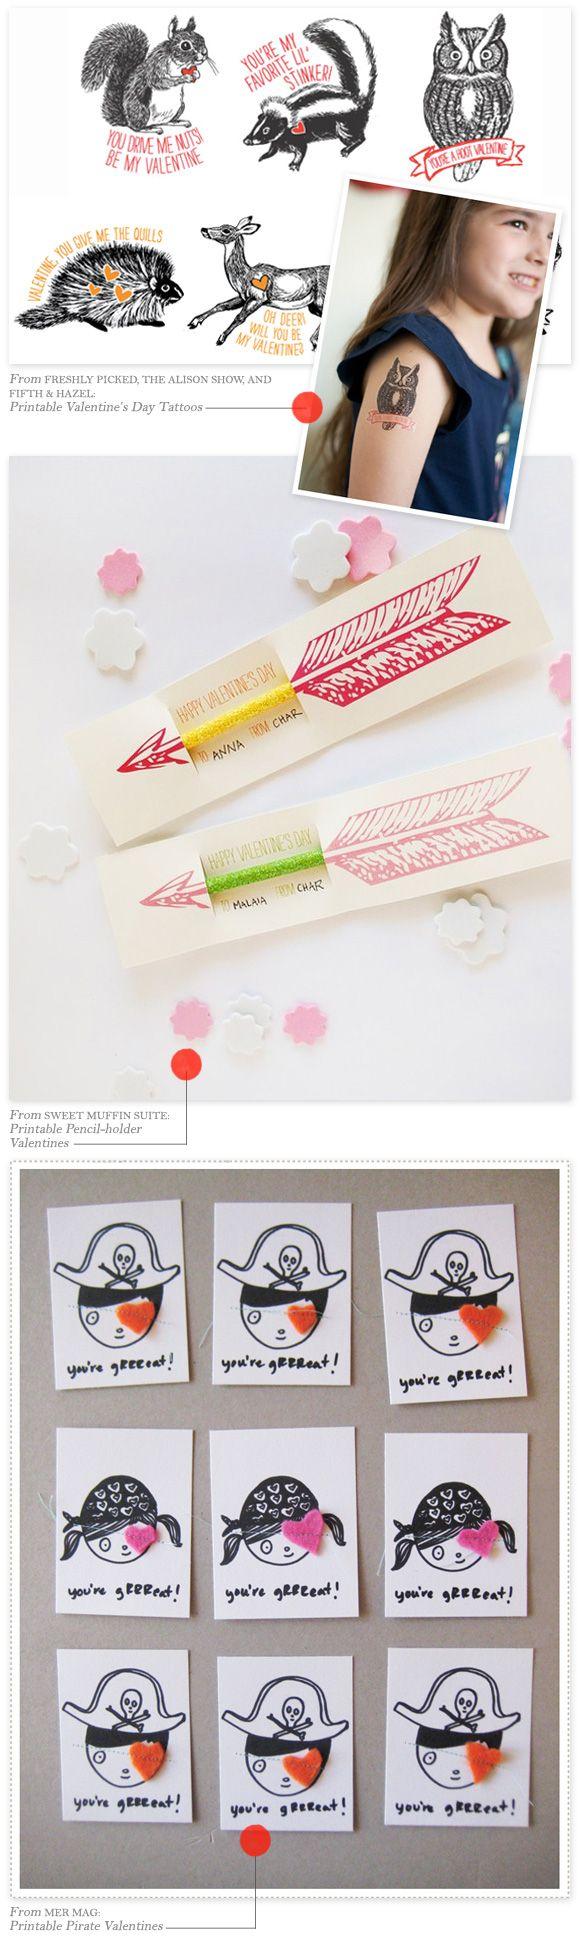 cuteDiy Fashion, Arrows Valentine, Vday Diy Gift, Vday Ideas, Diy Gifts, Vdaydiy Gift, Printables Cards, Creatures Comforters, Diy Projects